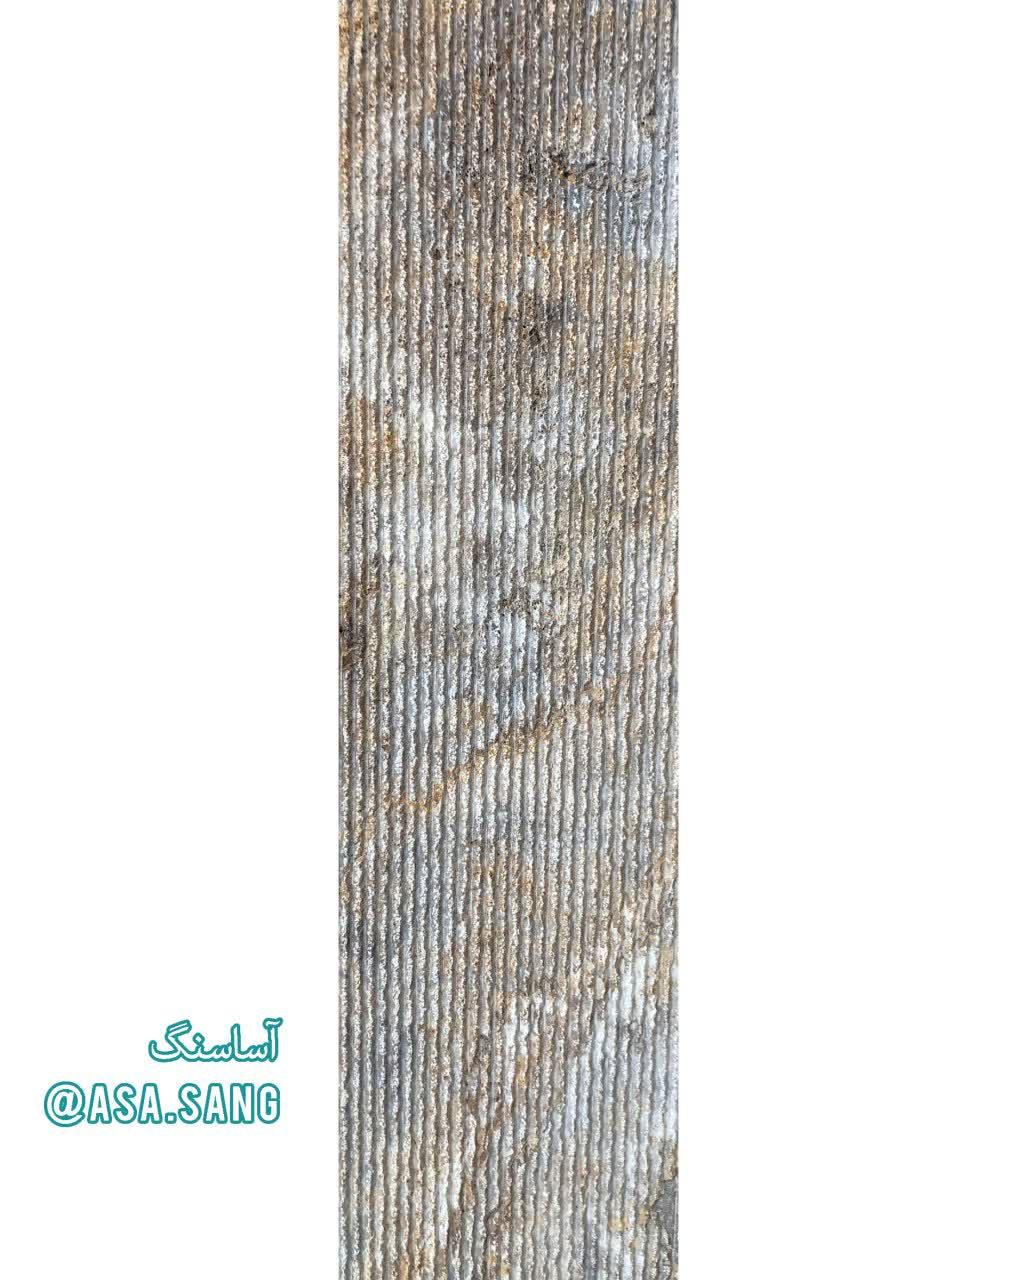 عکس محصول سنگ تراورتن دودی طلایی آذرشهر 11